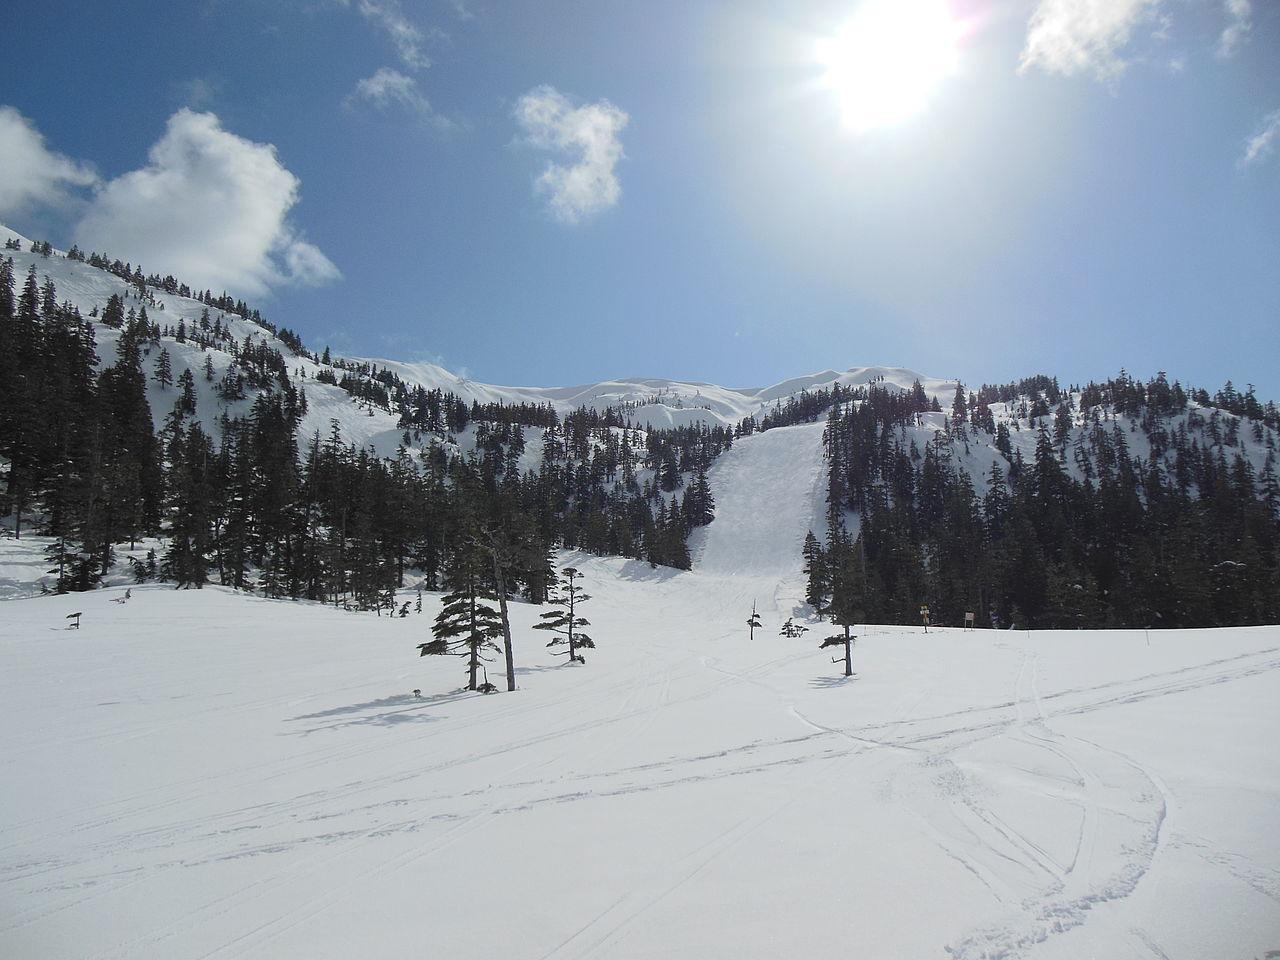 Eaglecrest Ski Area - Top Ski Resort in Alaska